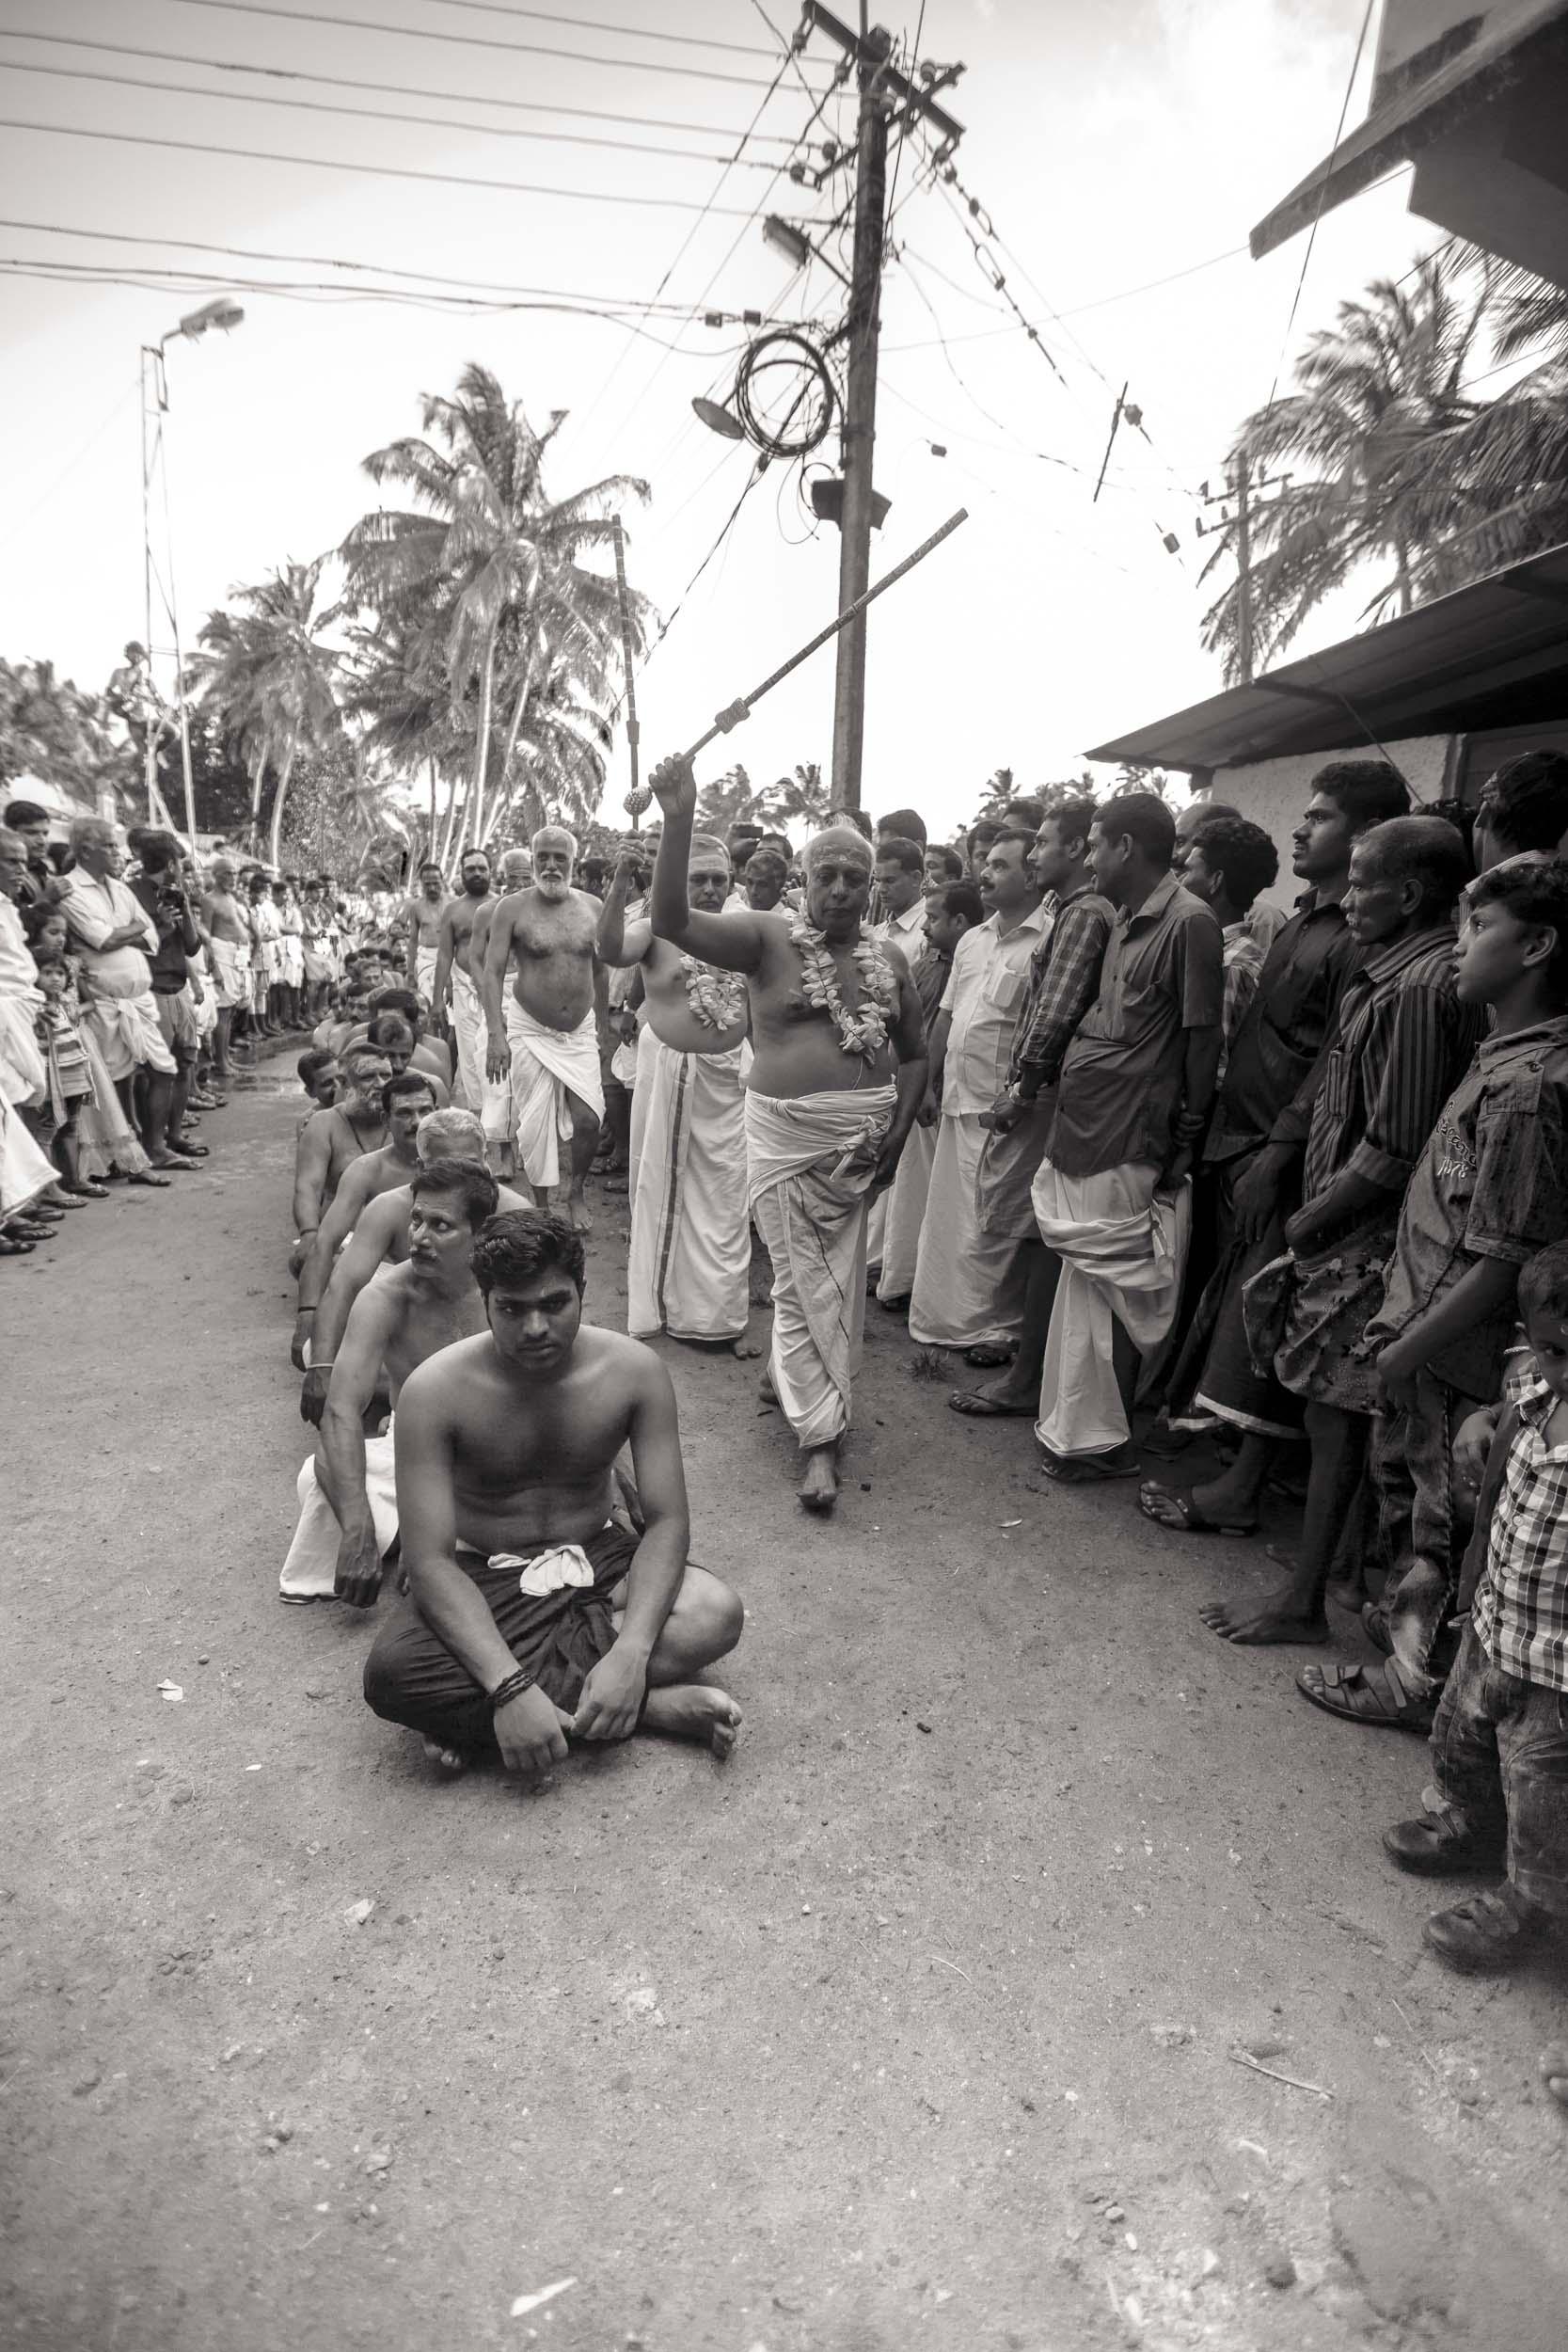 Sindhur_Photography_Travel_People_Kerala-43.JPG